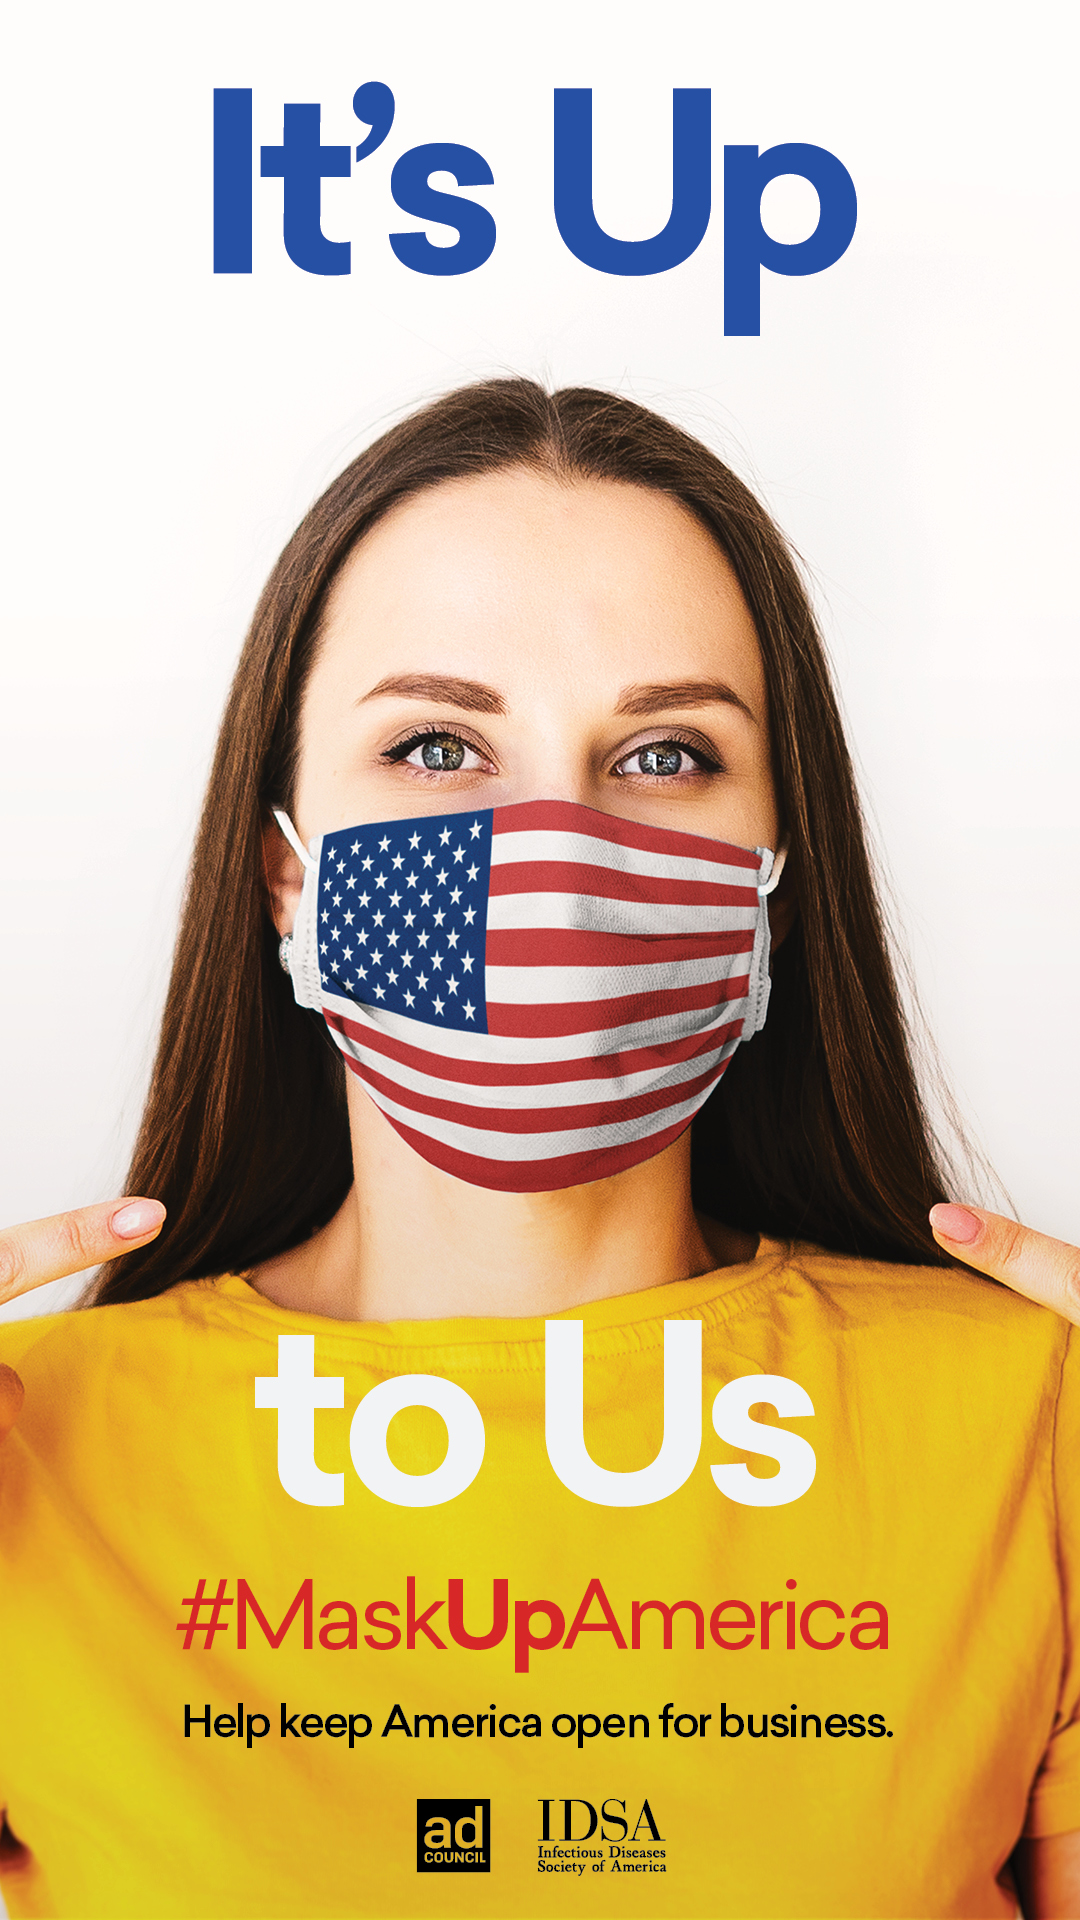 MUA_Up_to_Us_Woman_Yellow_Eng_1920x1080